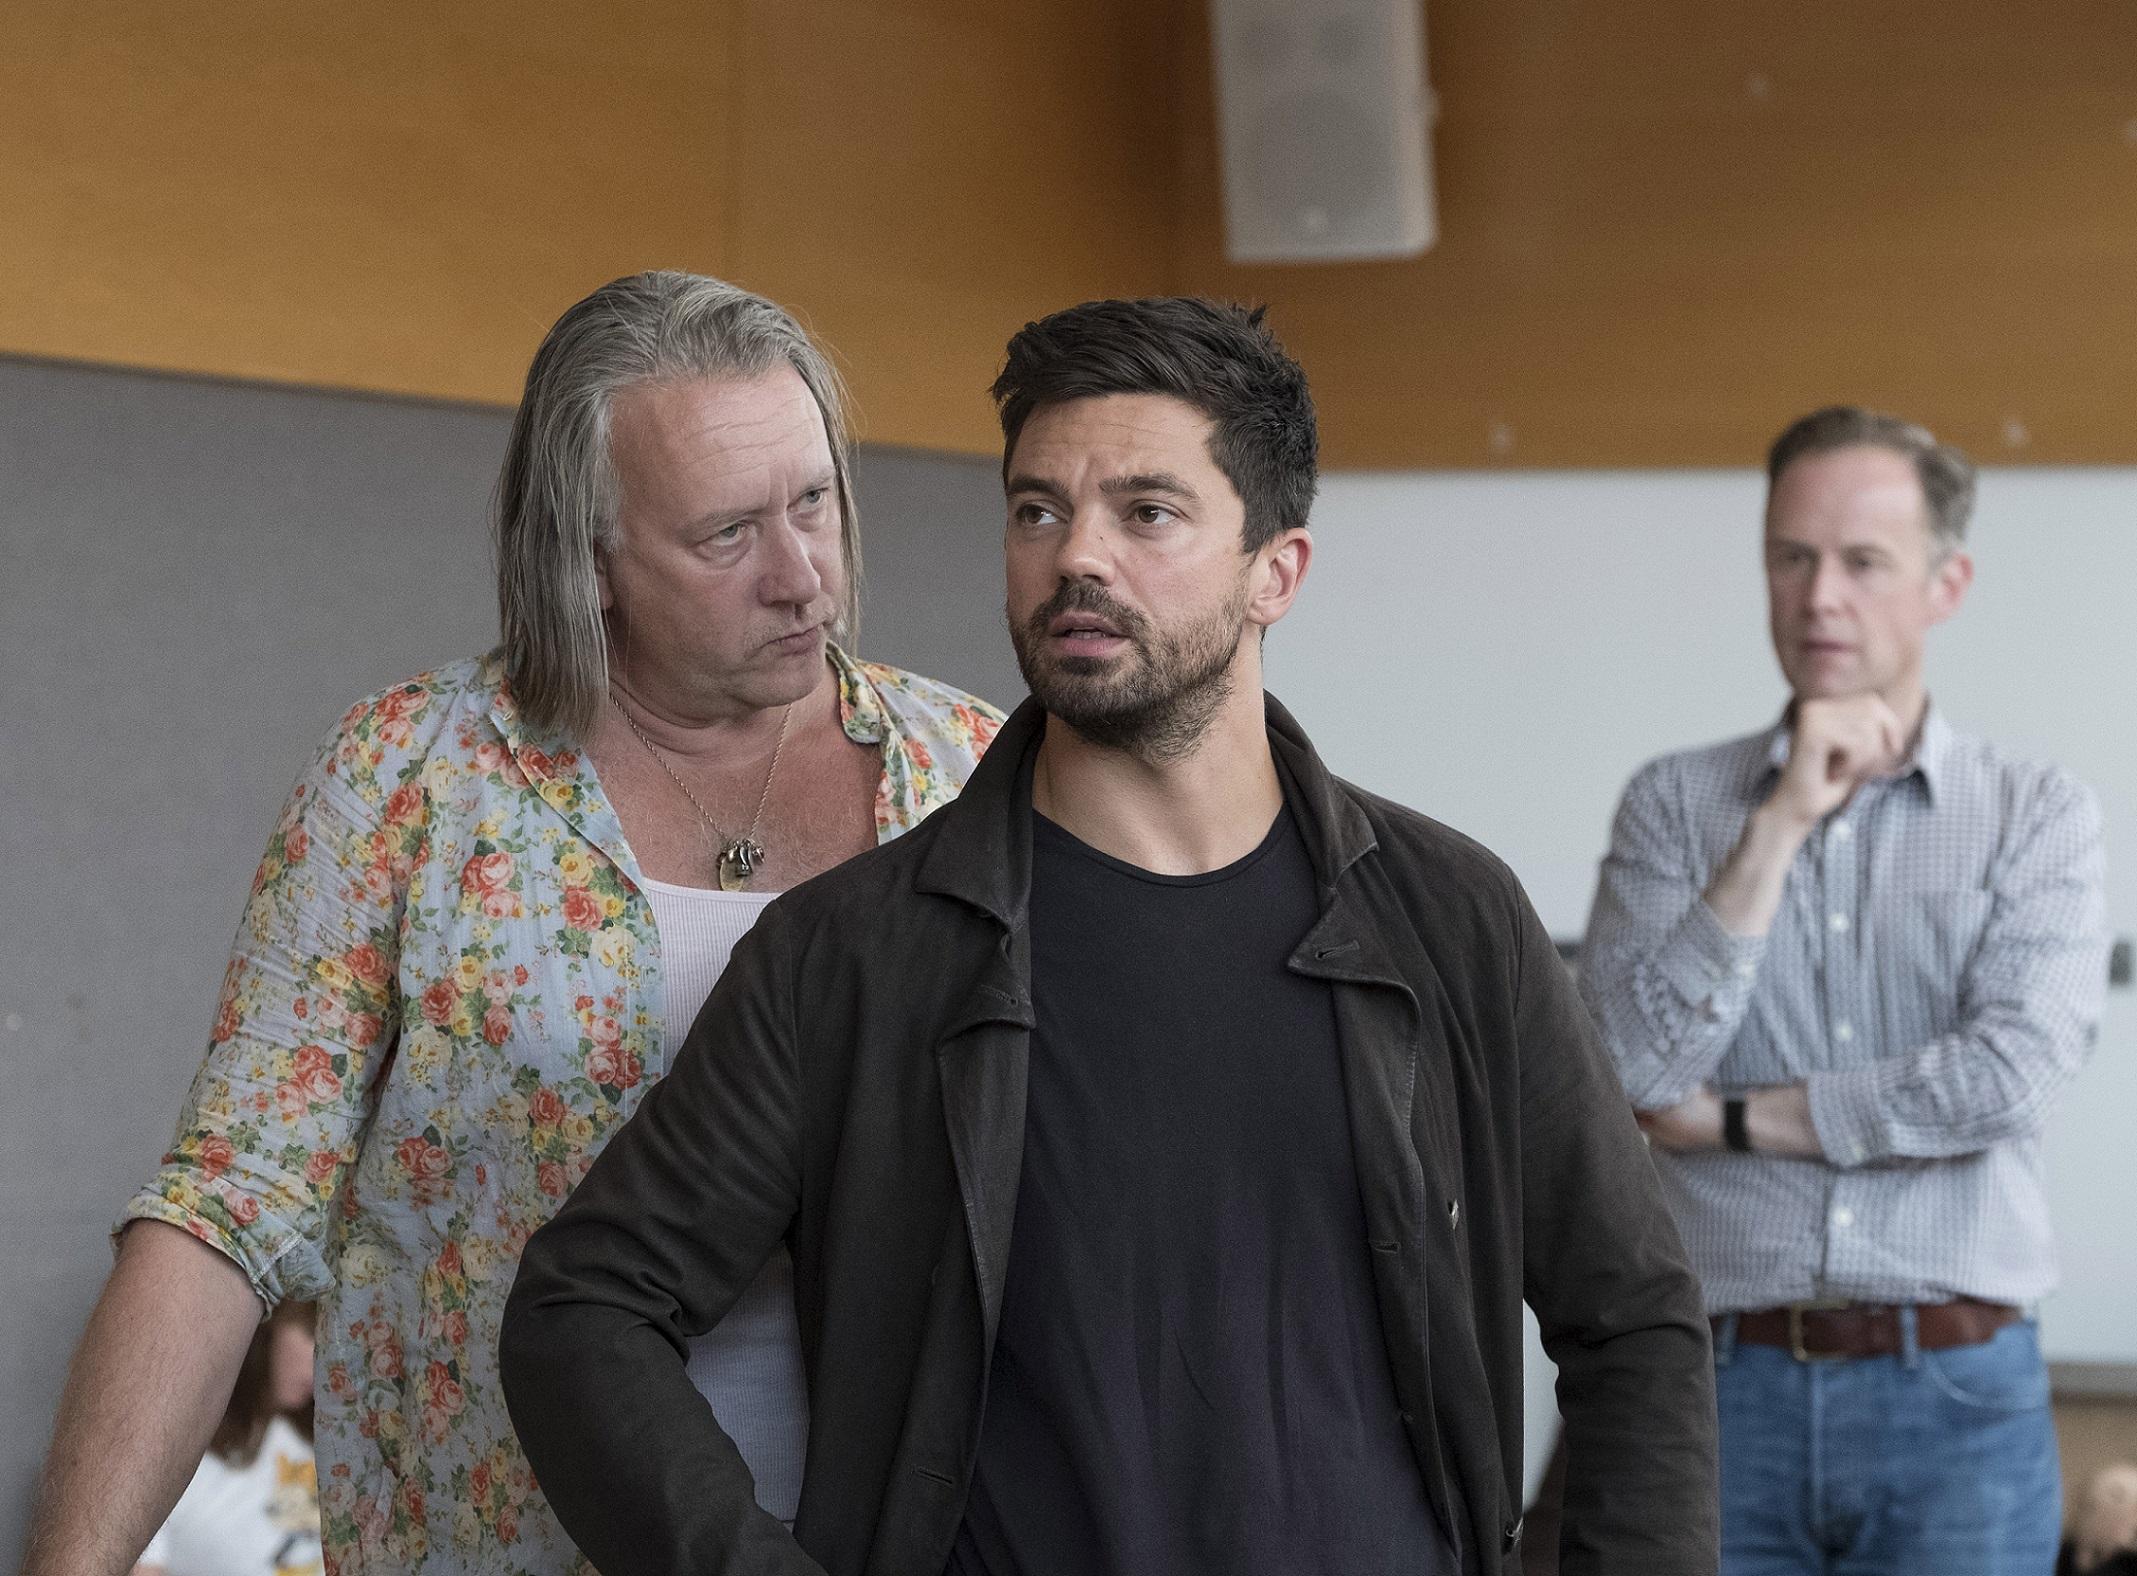 Jasper Britton, Dominic Cooper and Richard Teverson in rehearsals for The Libertine. Credit Alastair Muir.jpg.jpg